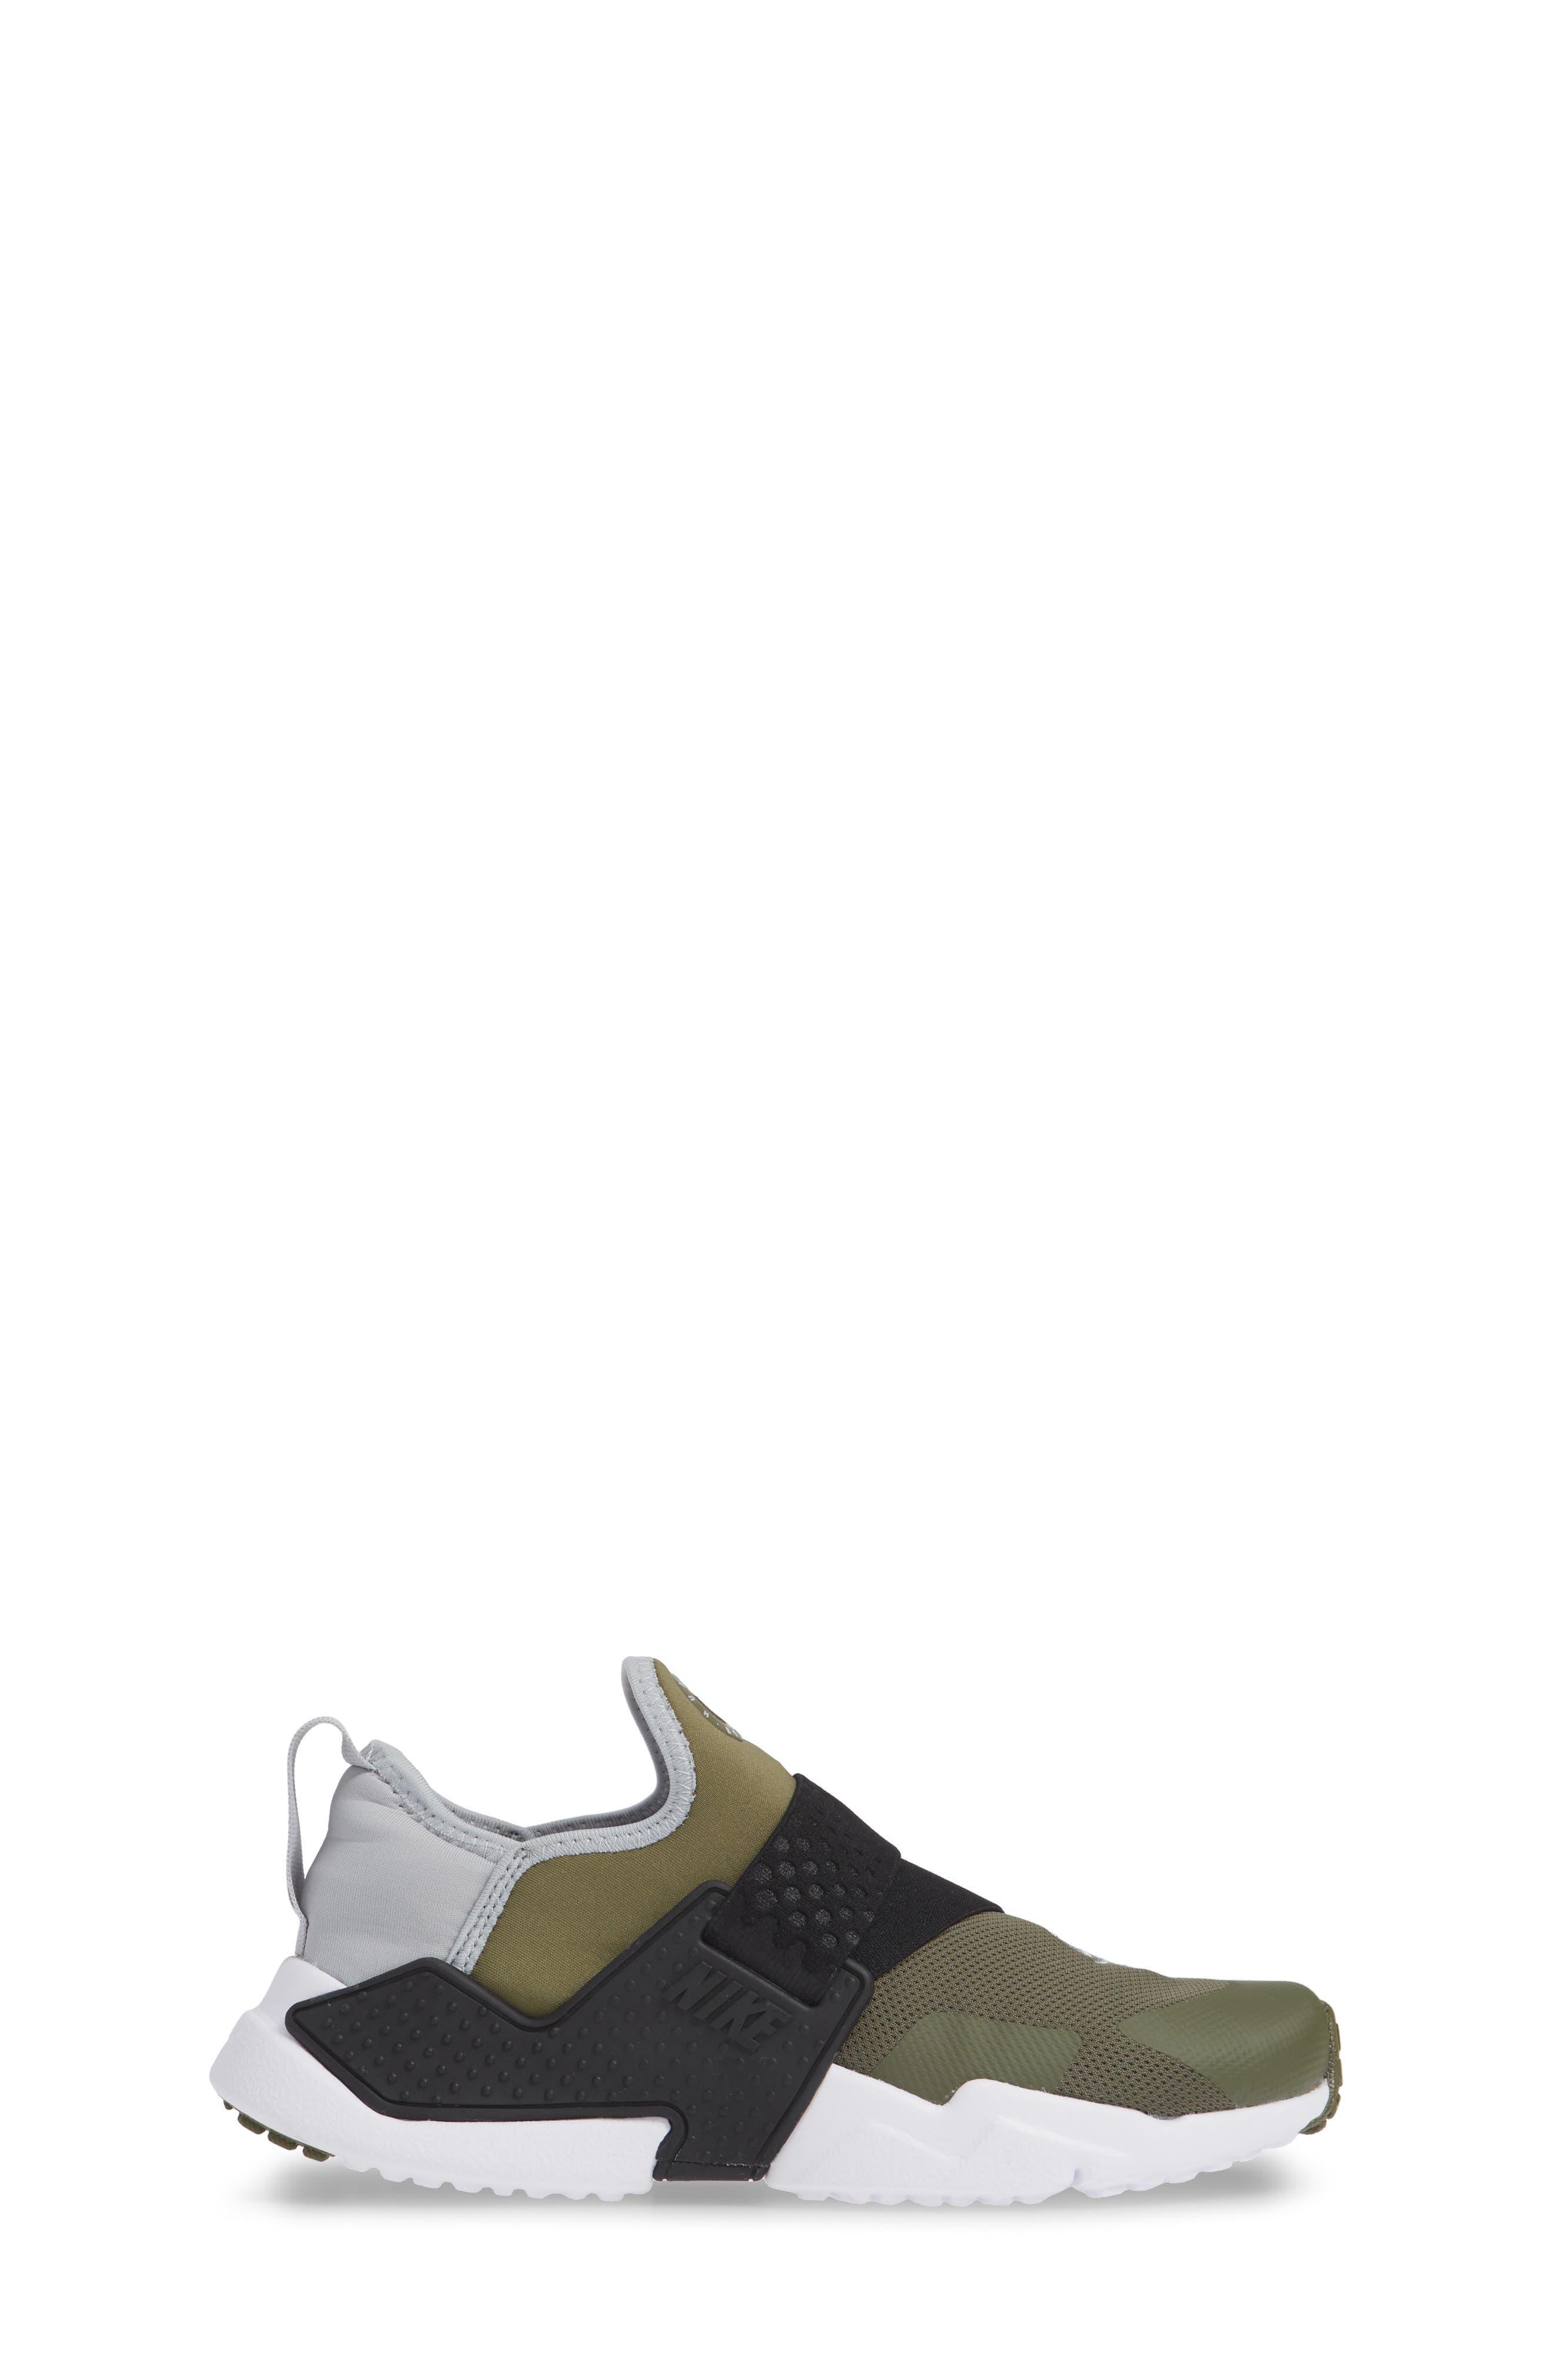 Huarache Extreme Sneaker,                             Alternate thumbnail 3, color,                             Olive/ Wolf Grey/ Black/ White